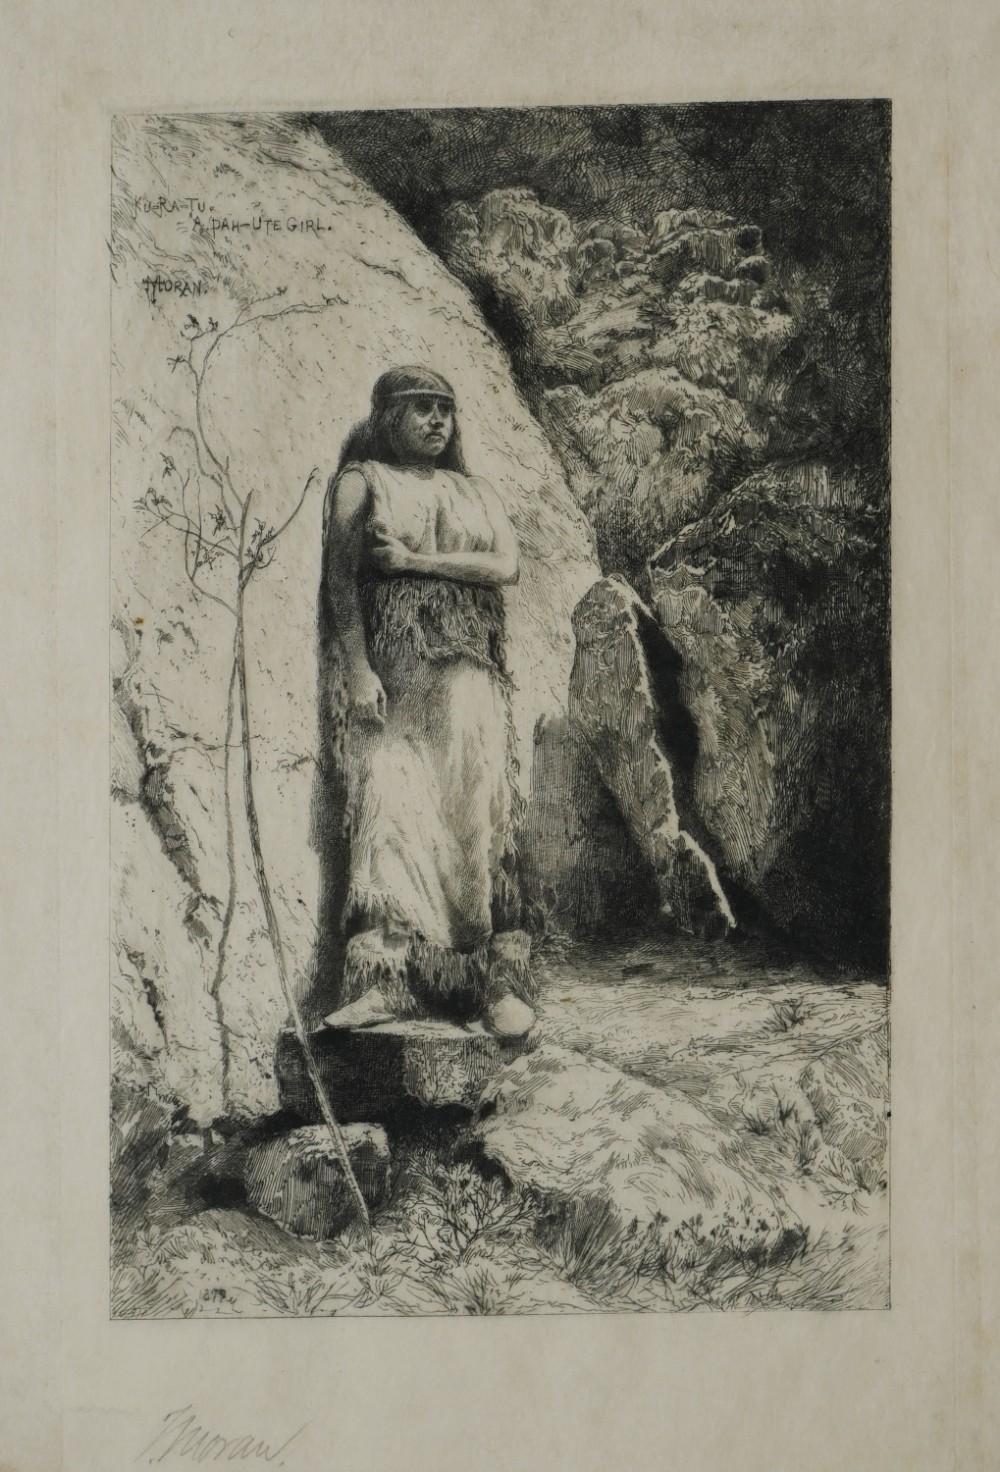 thomas moran american 18371926 a pahute girl 1879 etching print